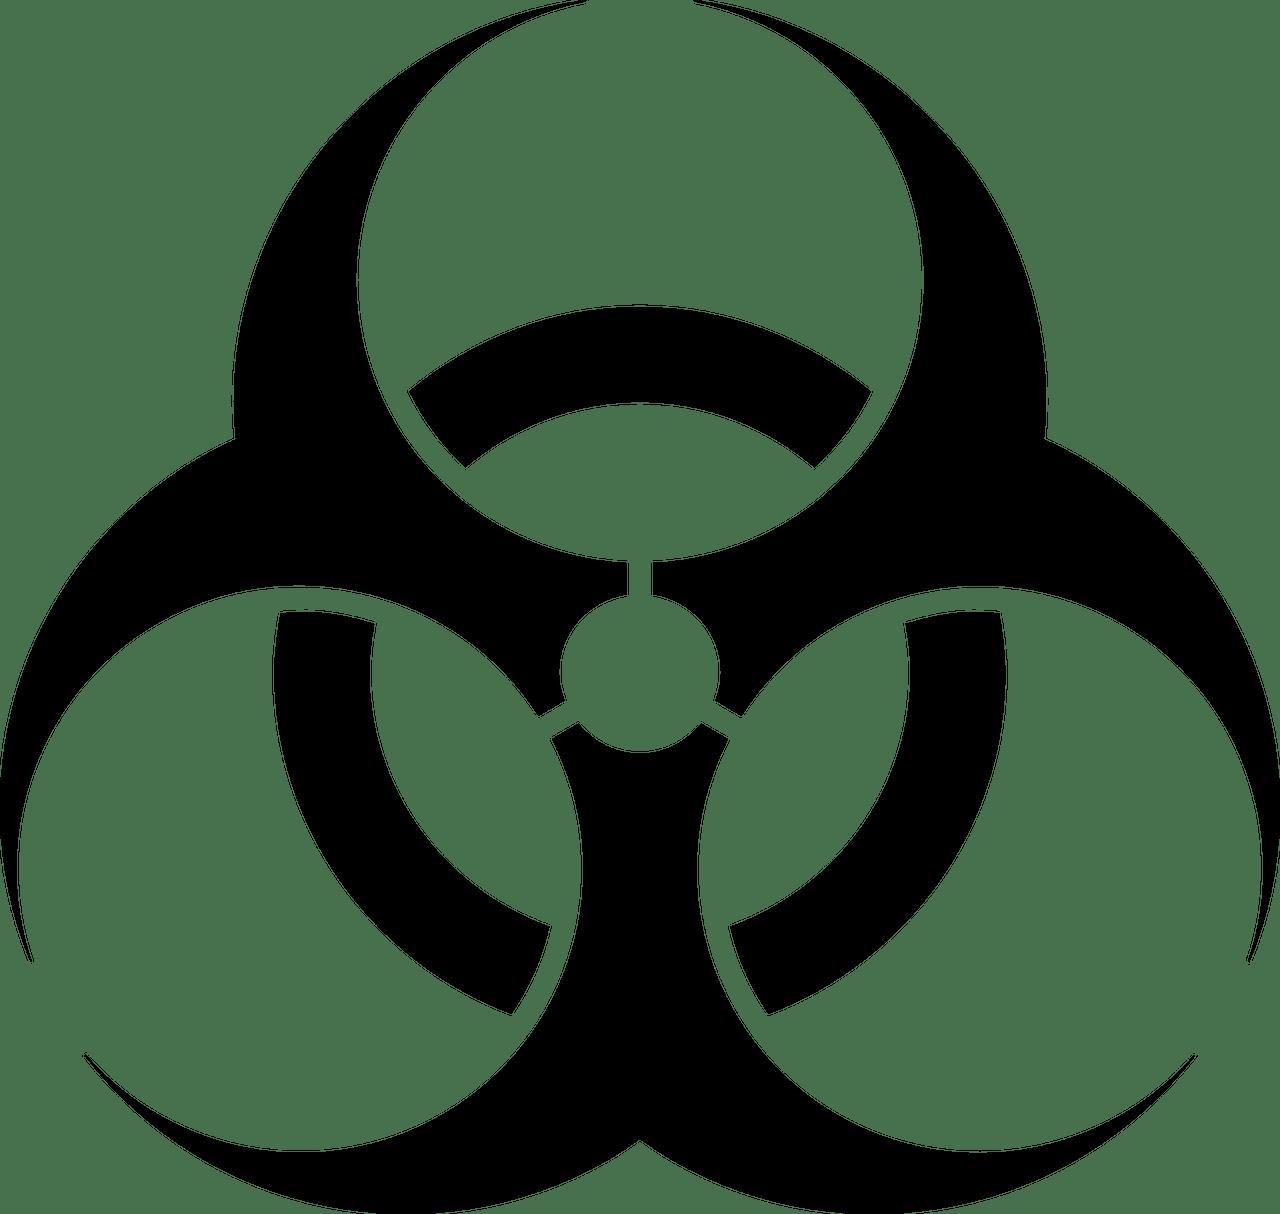 biohazard-symbol-30106_1280